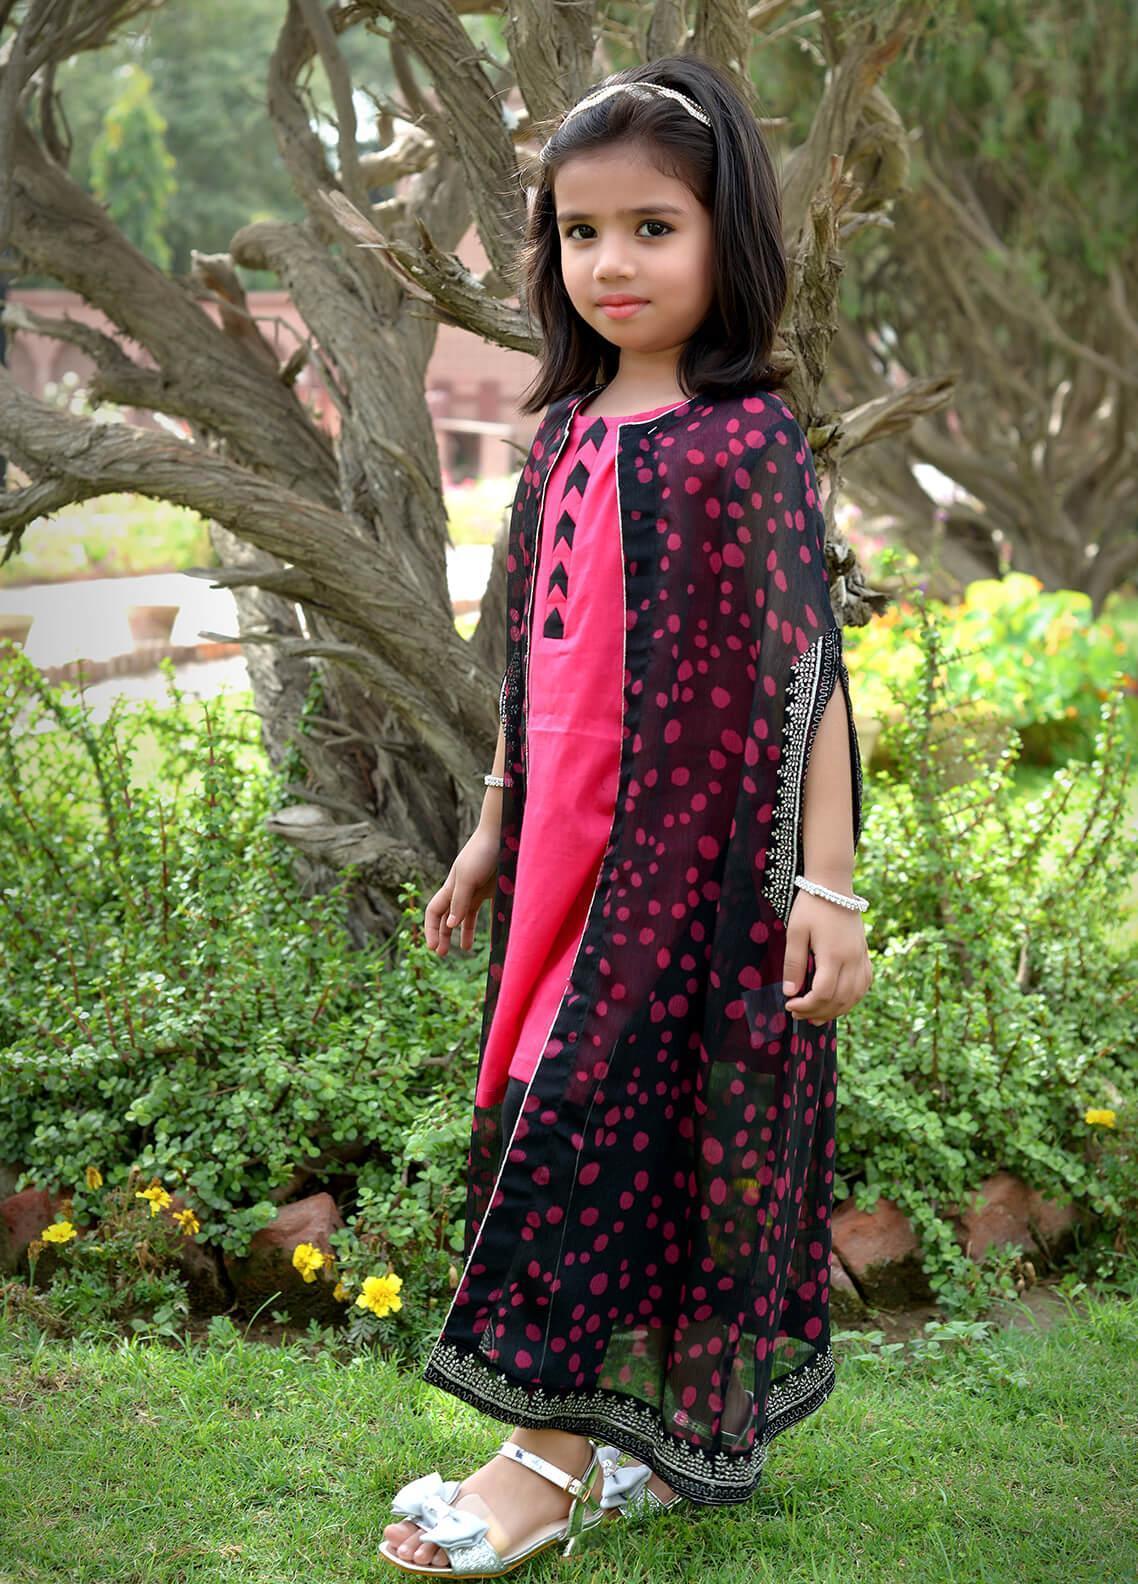 Nargis Shaheen Cotton Net Formal 3 Piece Suit for Girls -  NSK-001 Pink